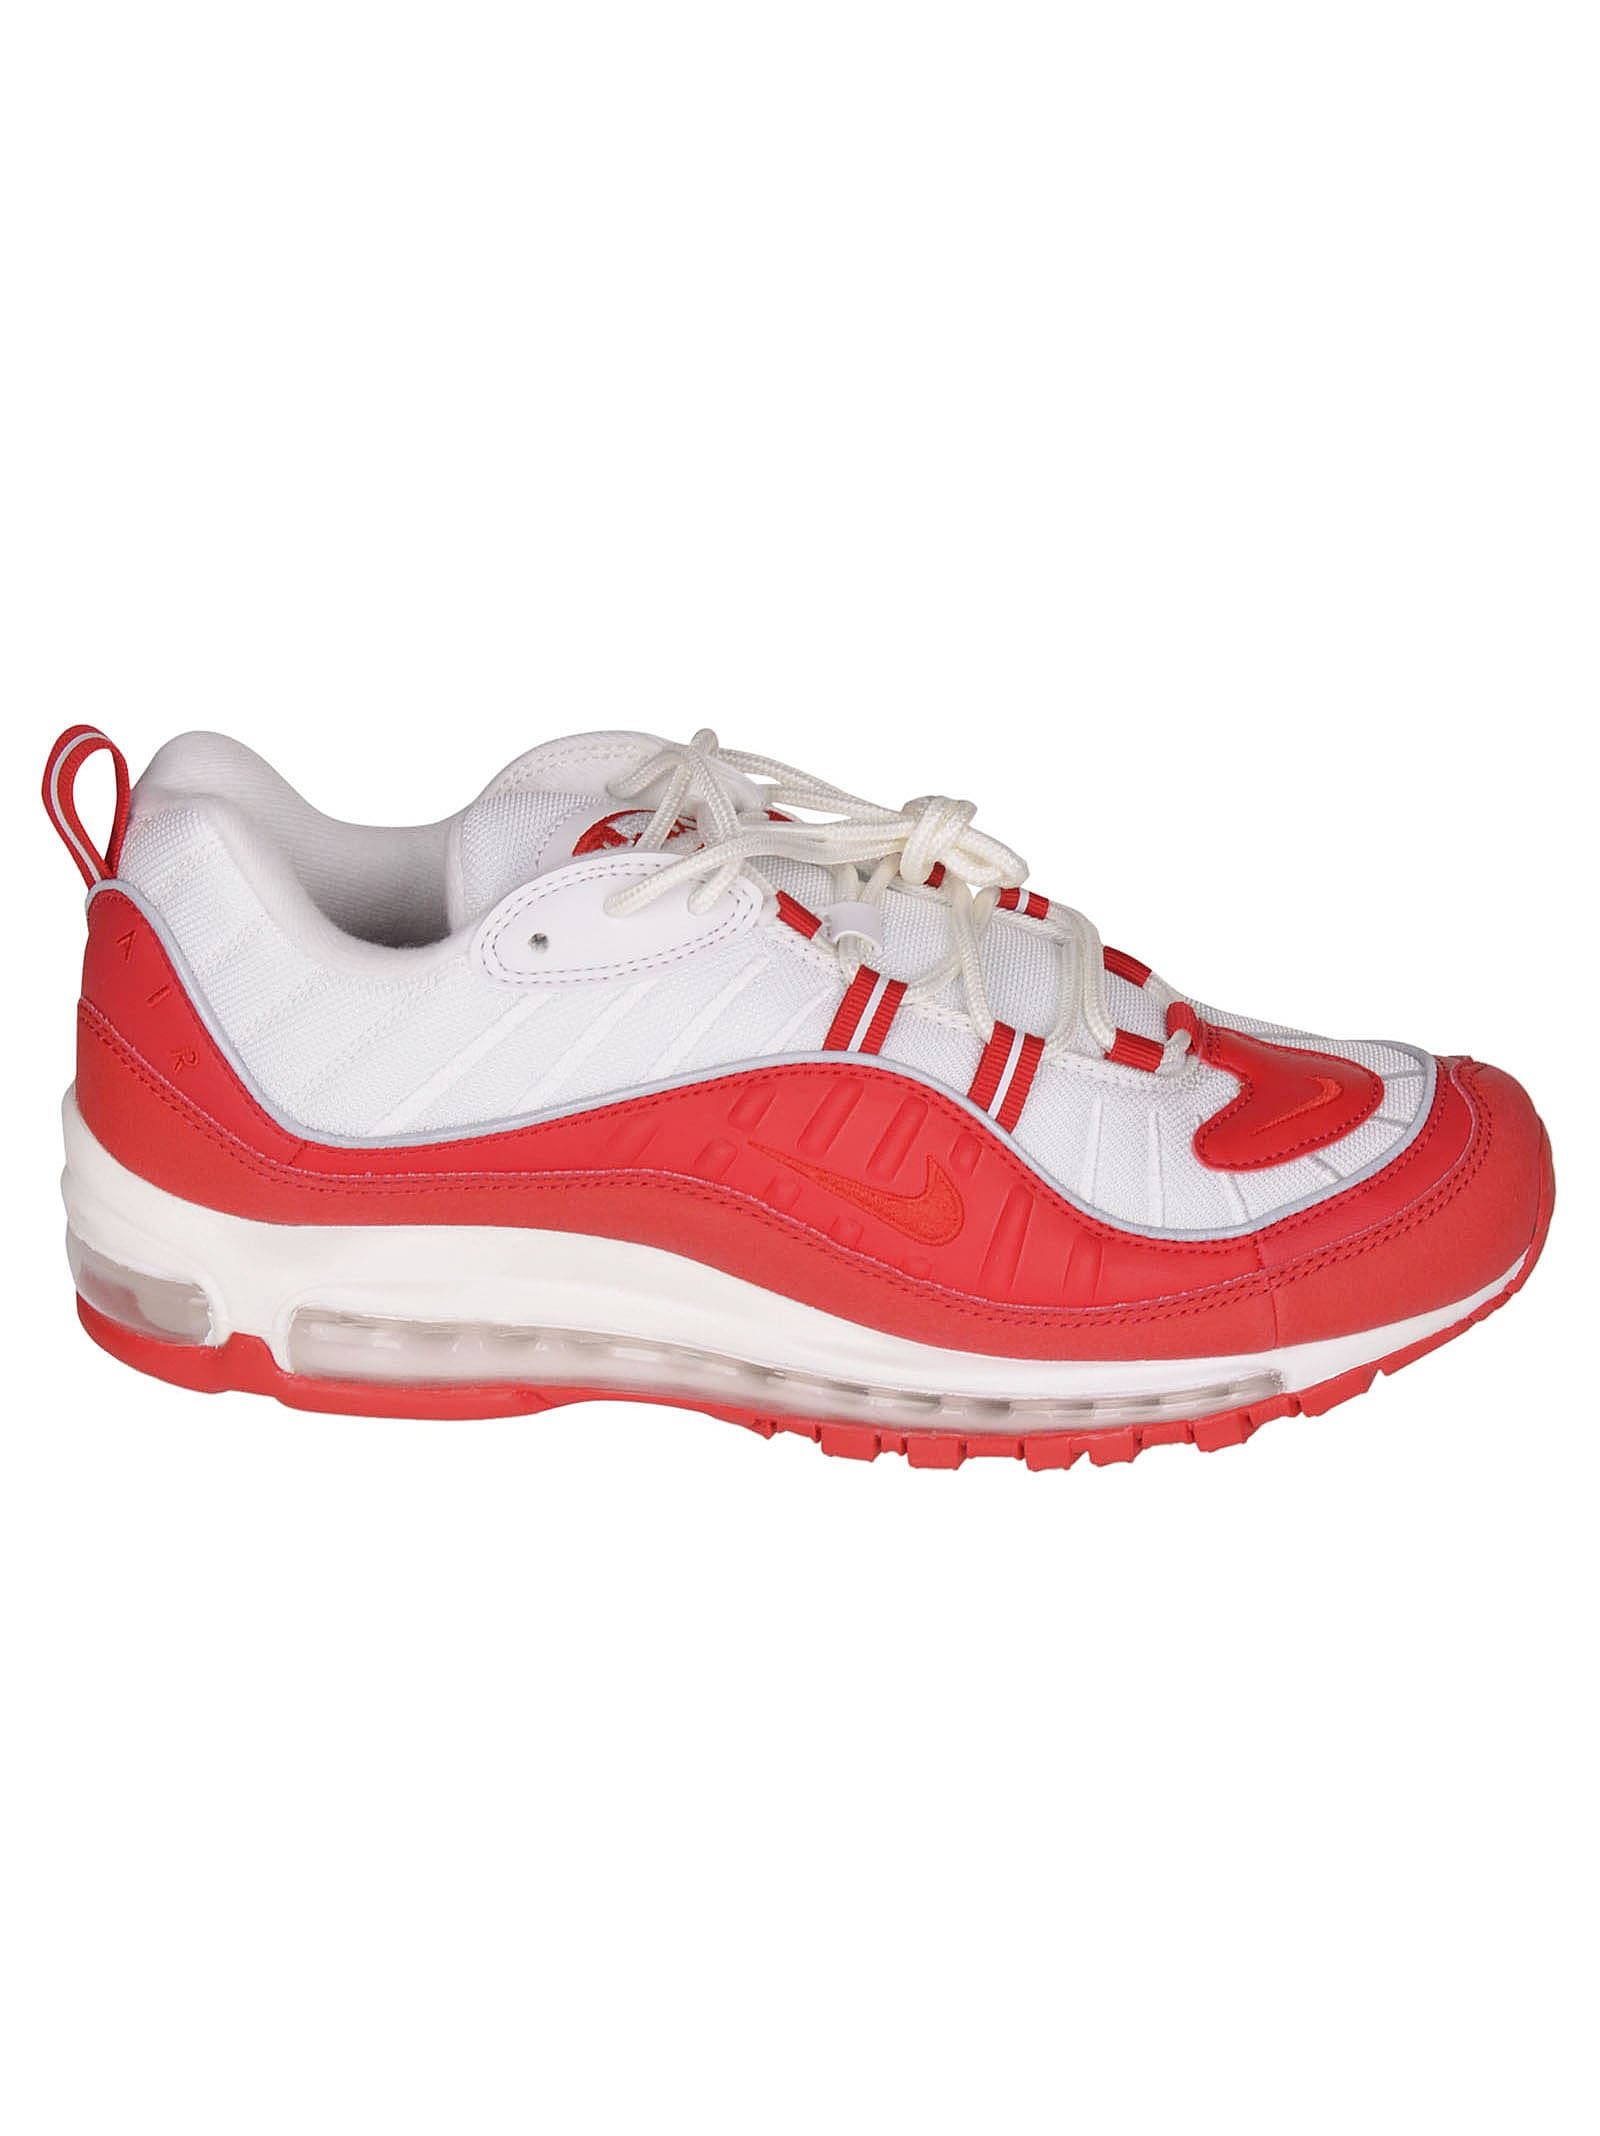 best service e0443 3e41d Nike Air Max 98 Sneakers